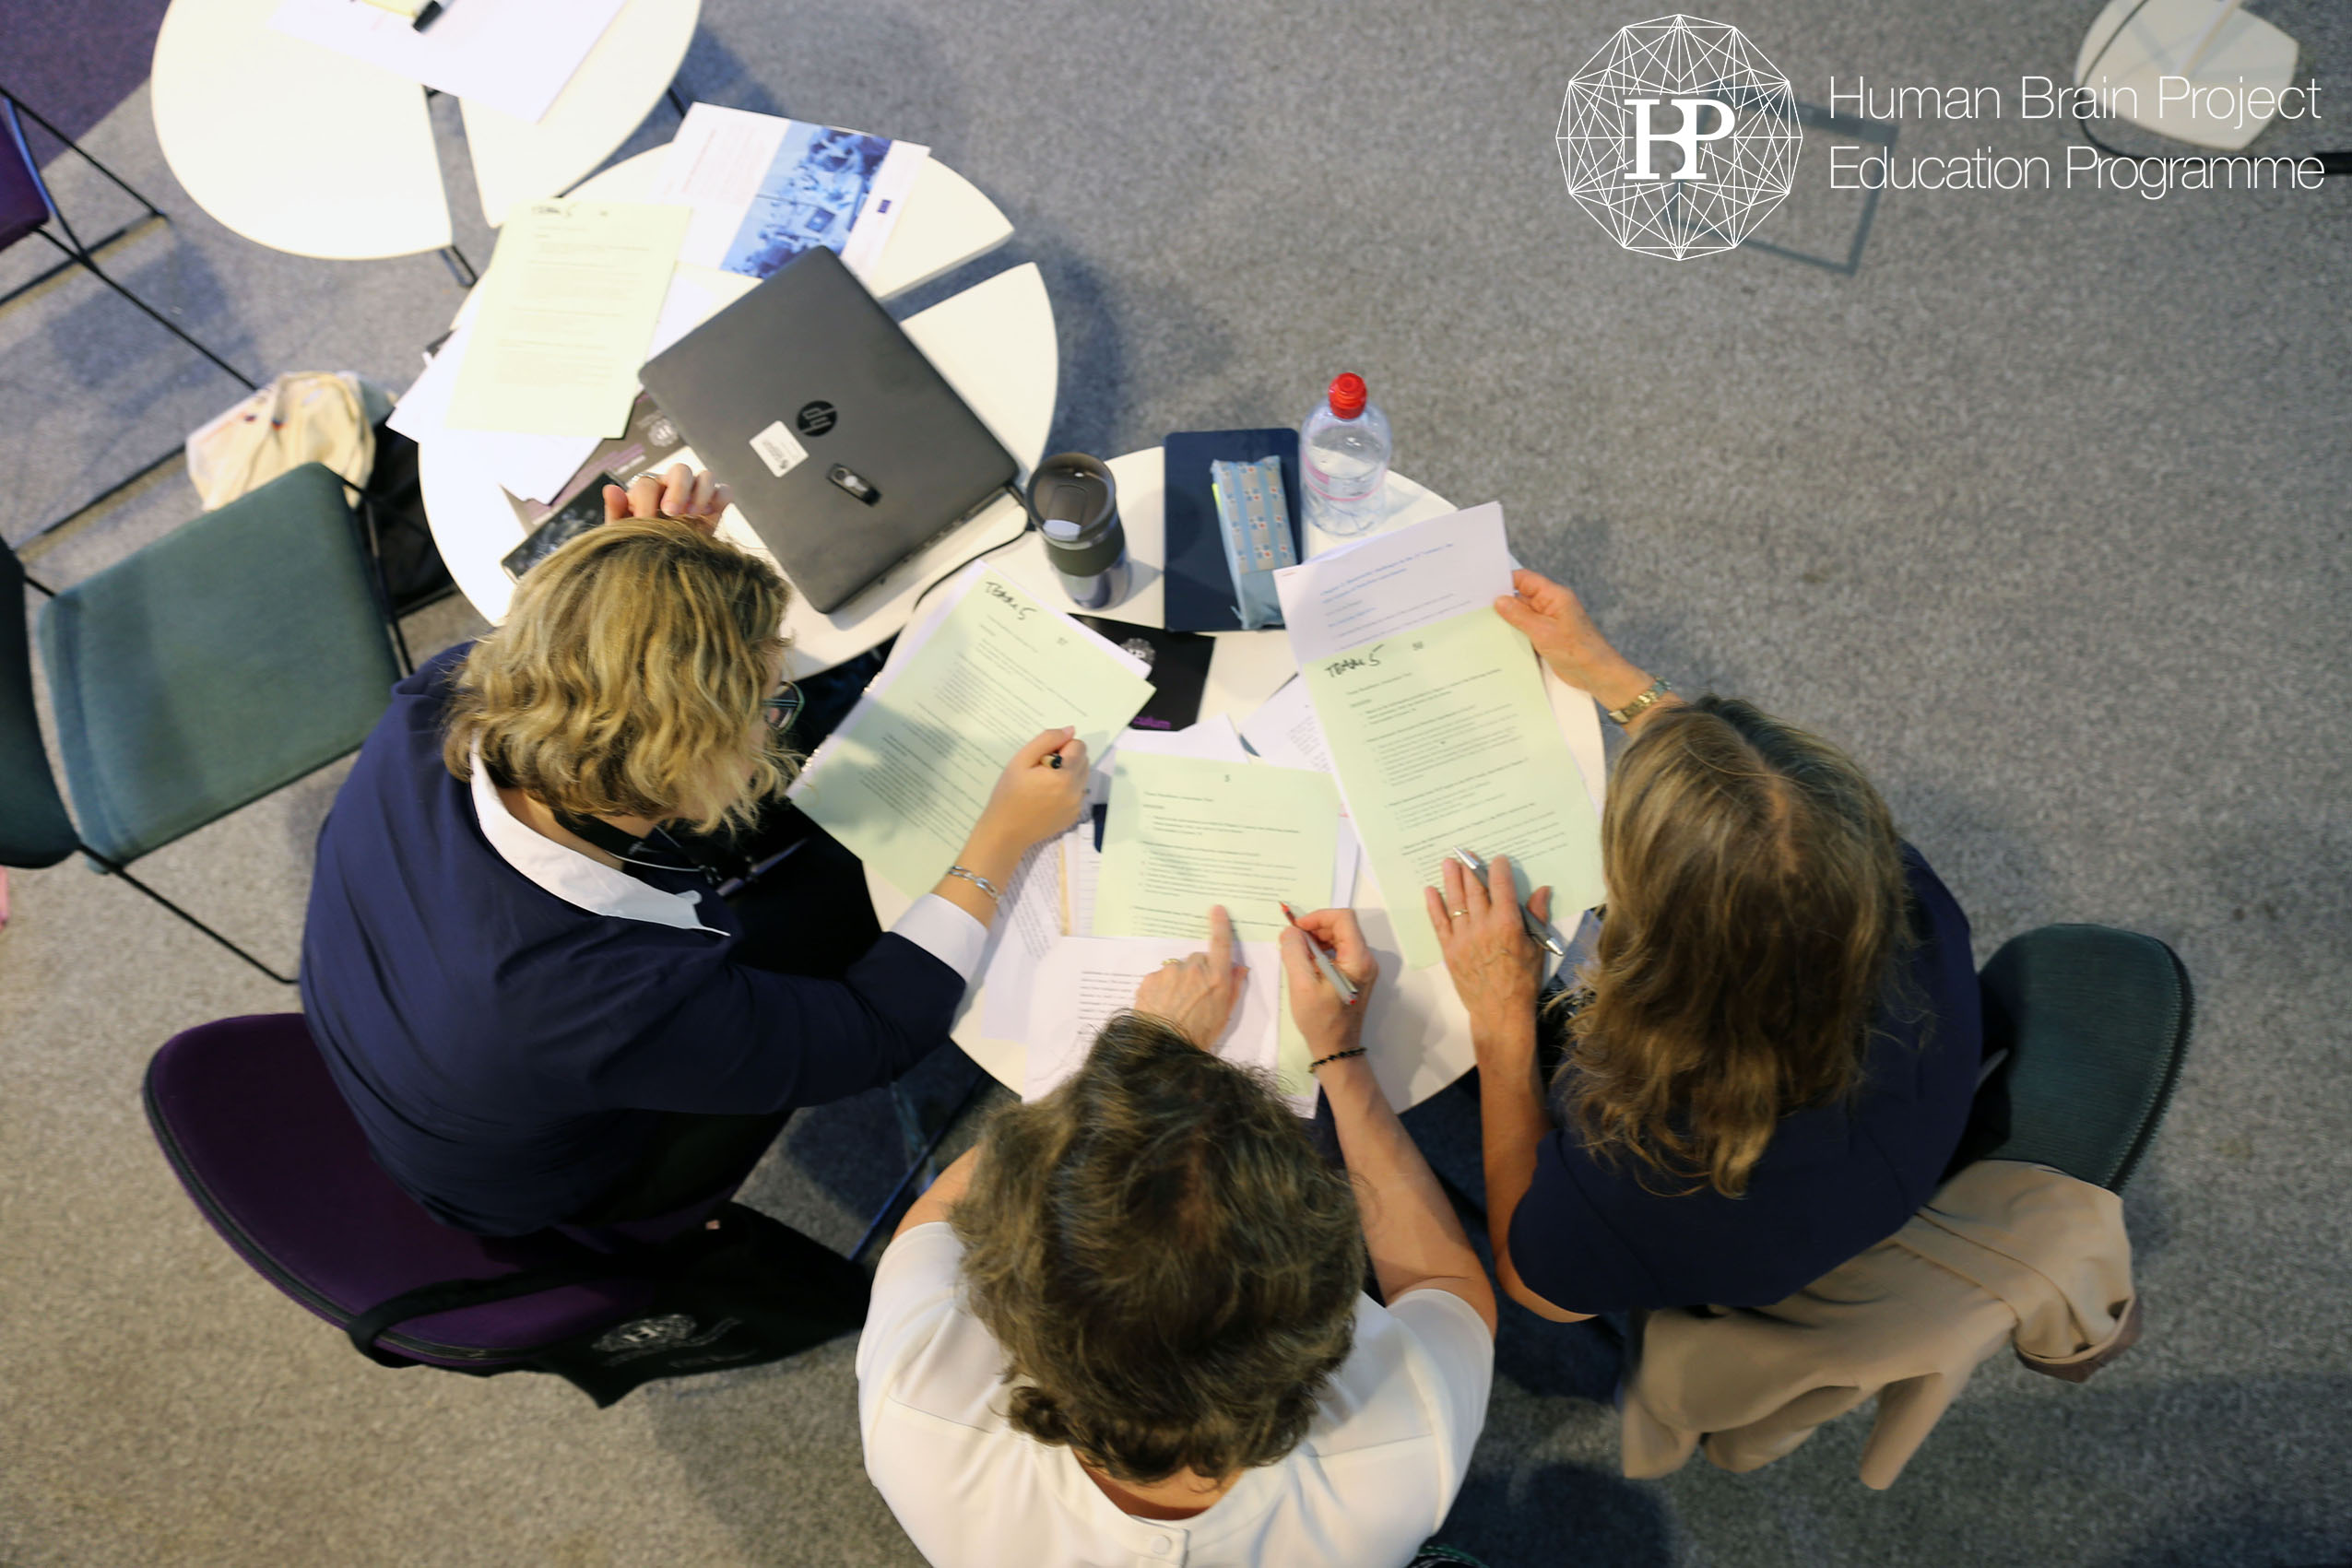 HBP_1st_Ethics_workshop_10.jpg -